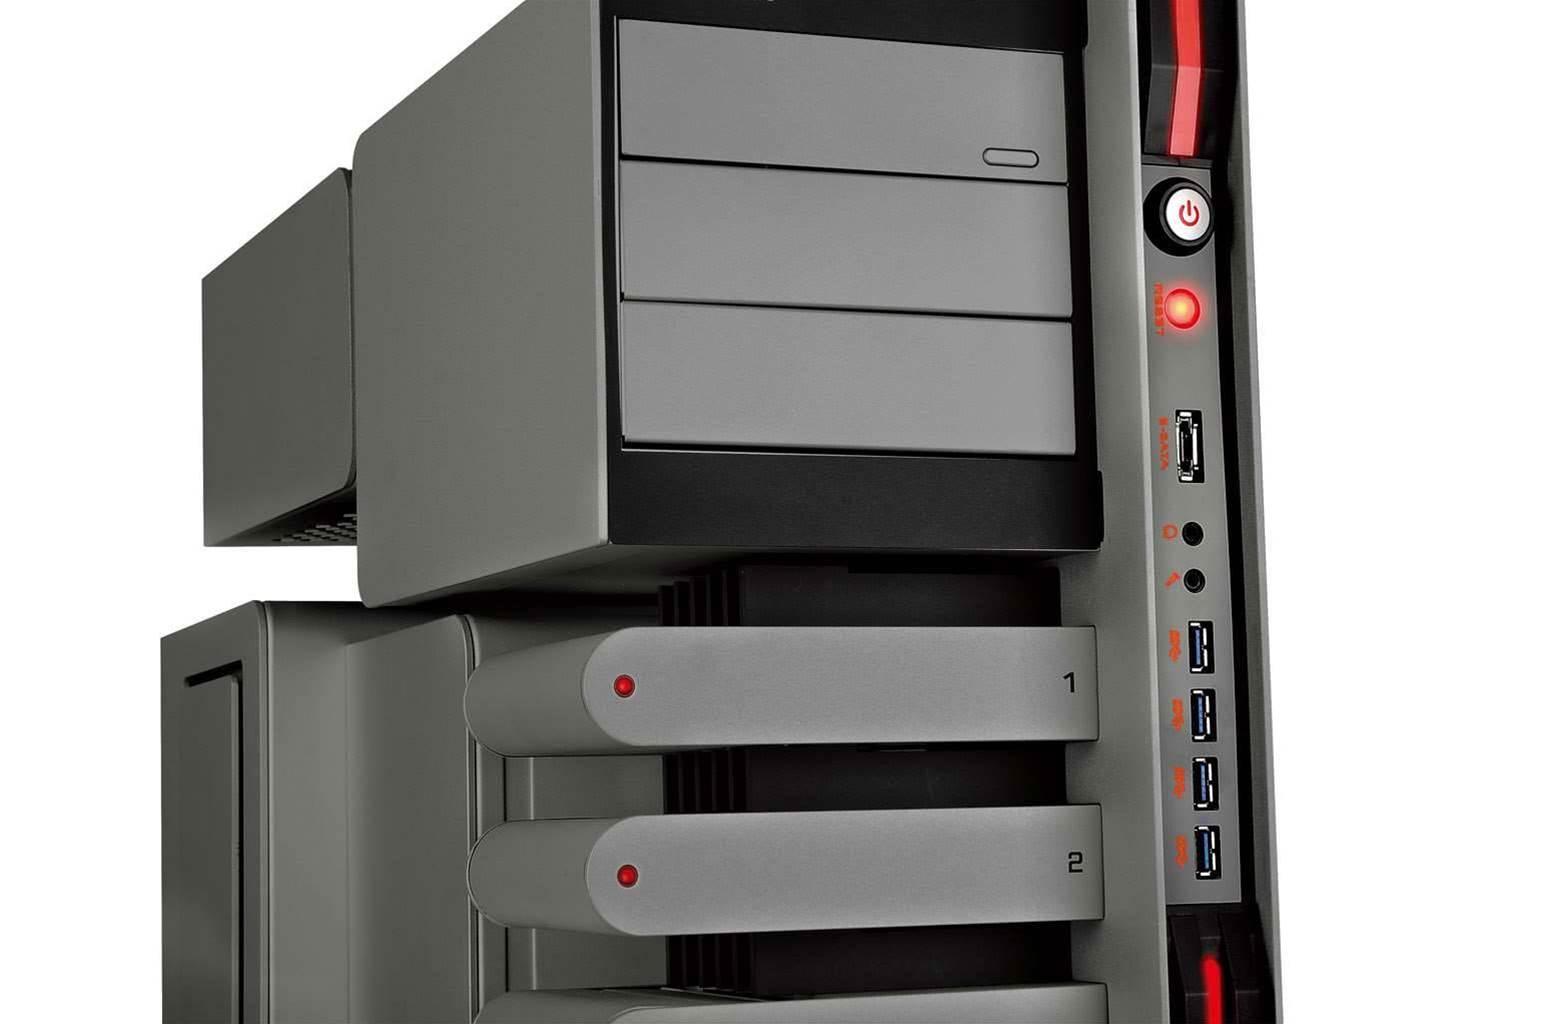 Thermaltake's new Level 10 Titanium is... a pretty serious PC case